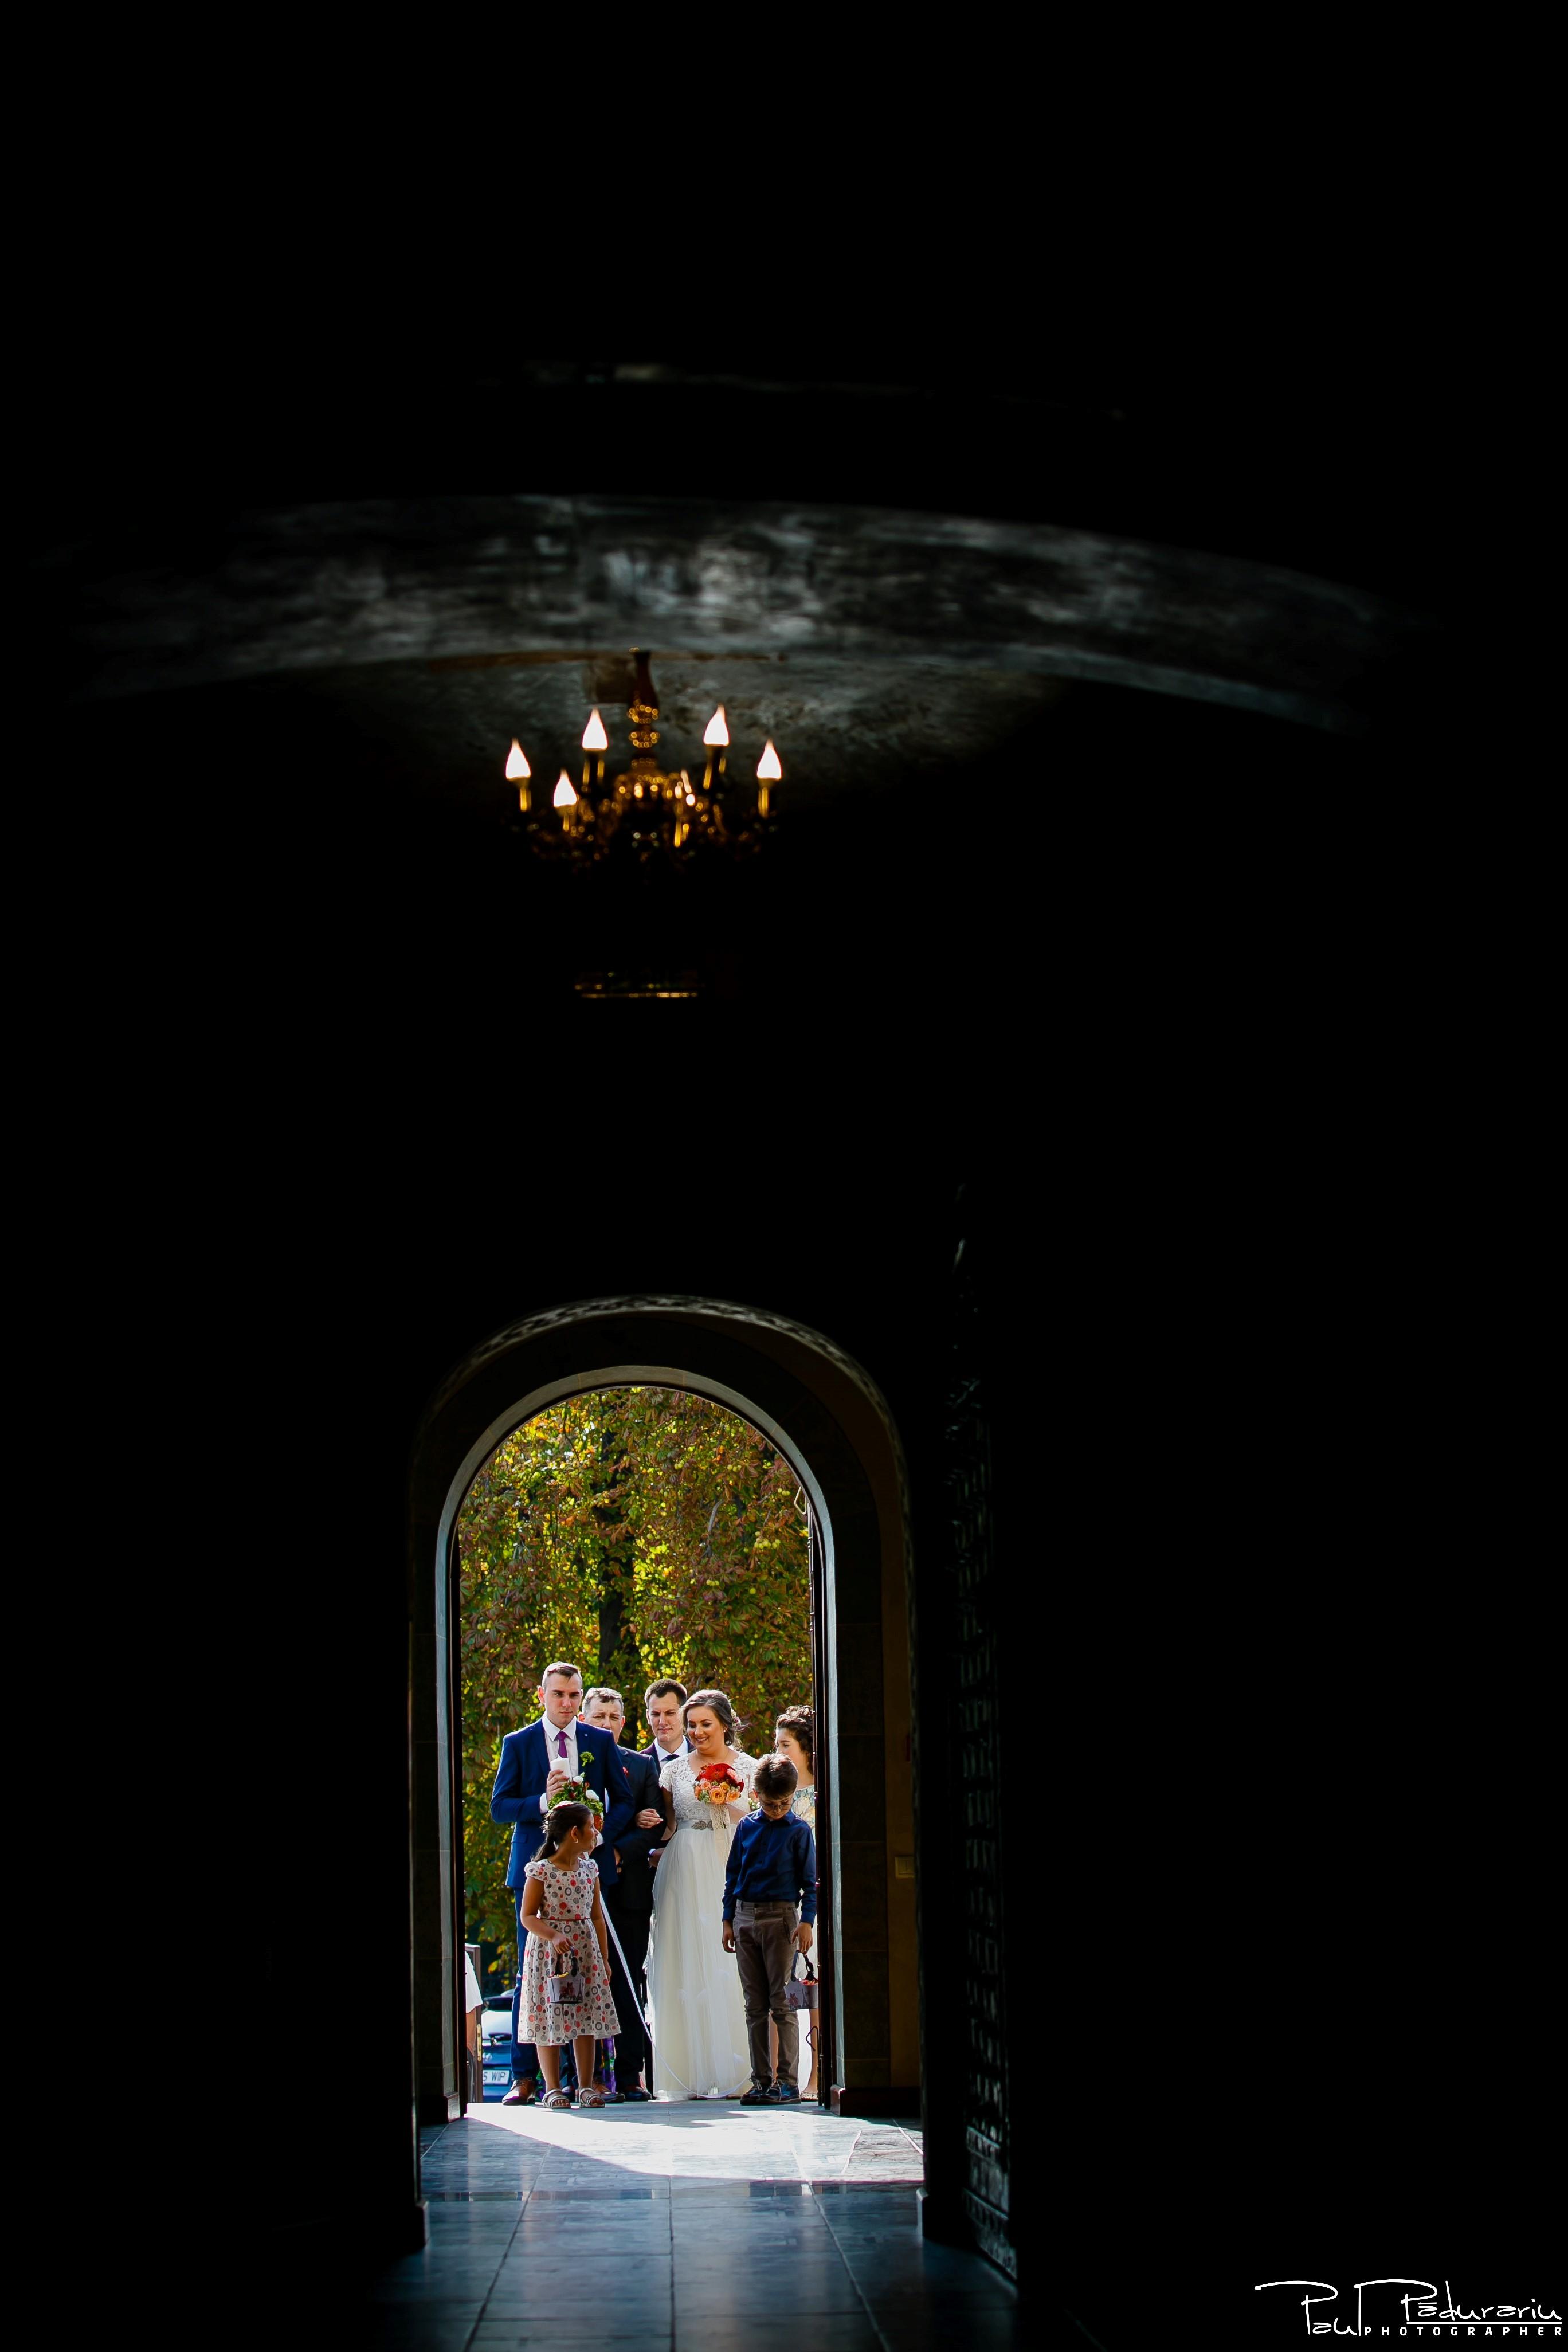 Cristina si Razvan nunta rustica la Bellaria Iasi cununia religioasa intrarea in biserica fotograf profesionist nunta www.paulpadurariu.ro © 2017 Paul Padurariu